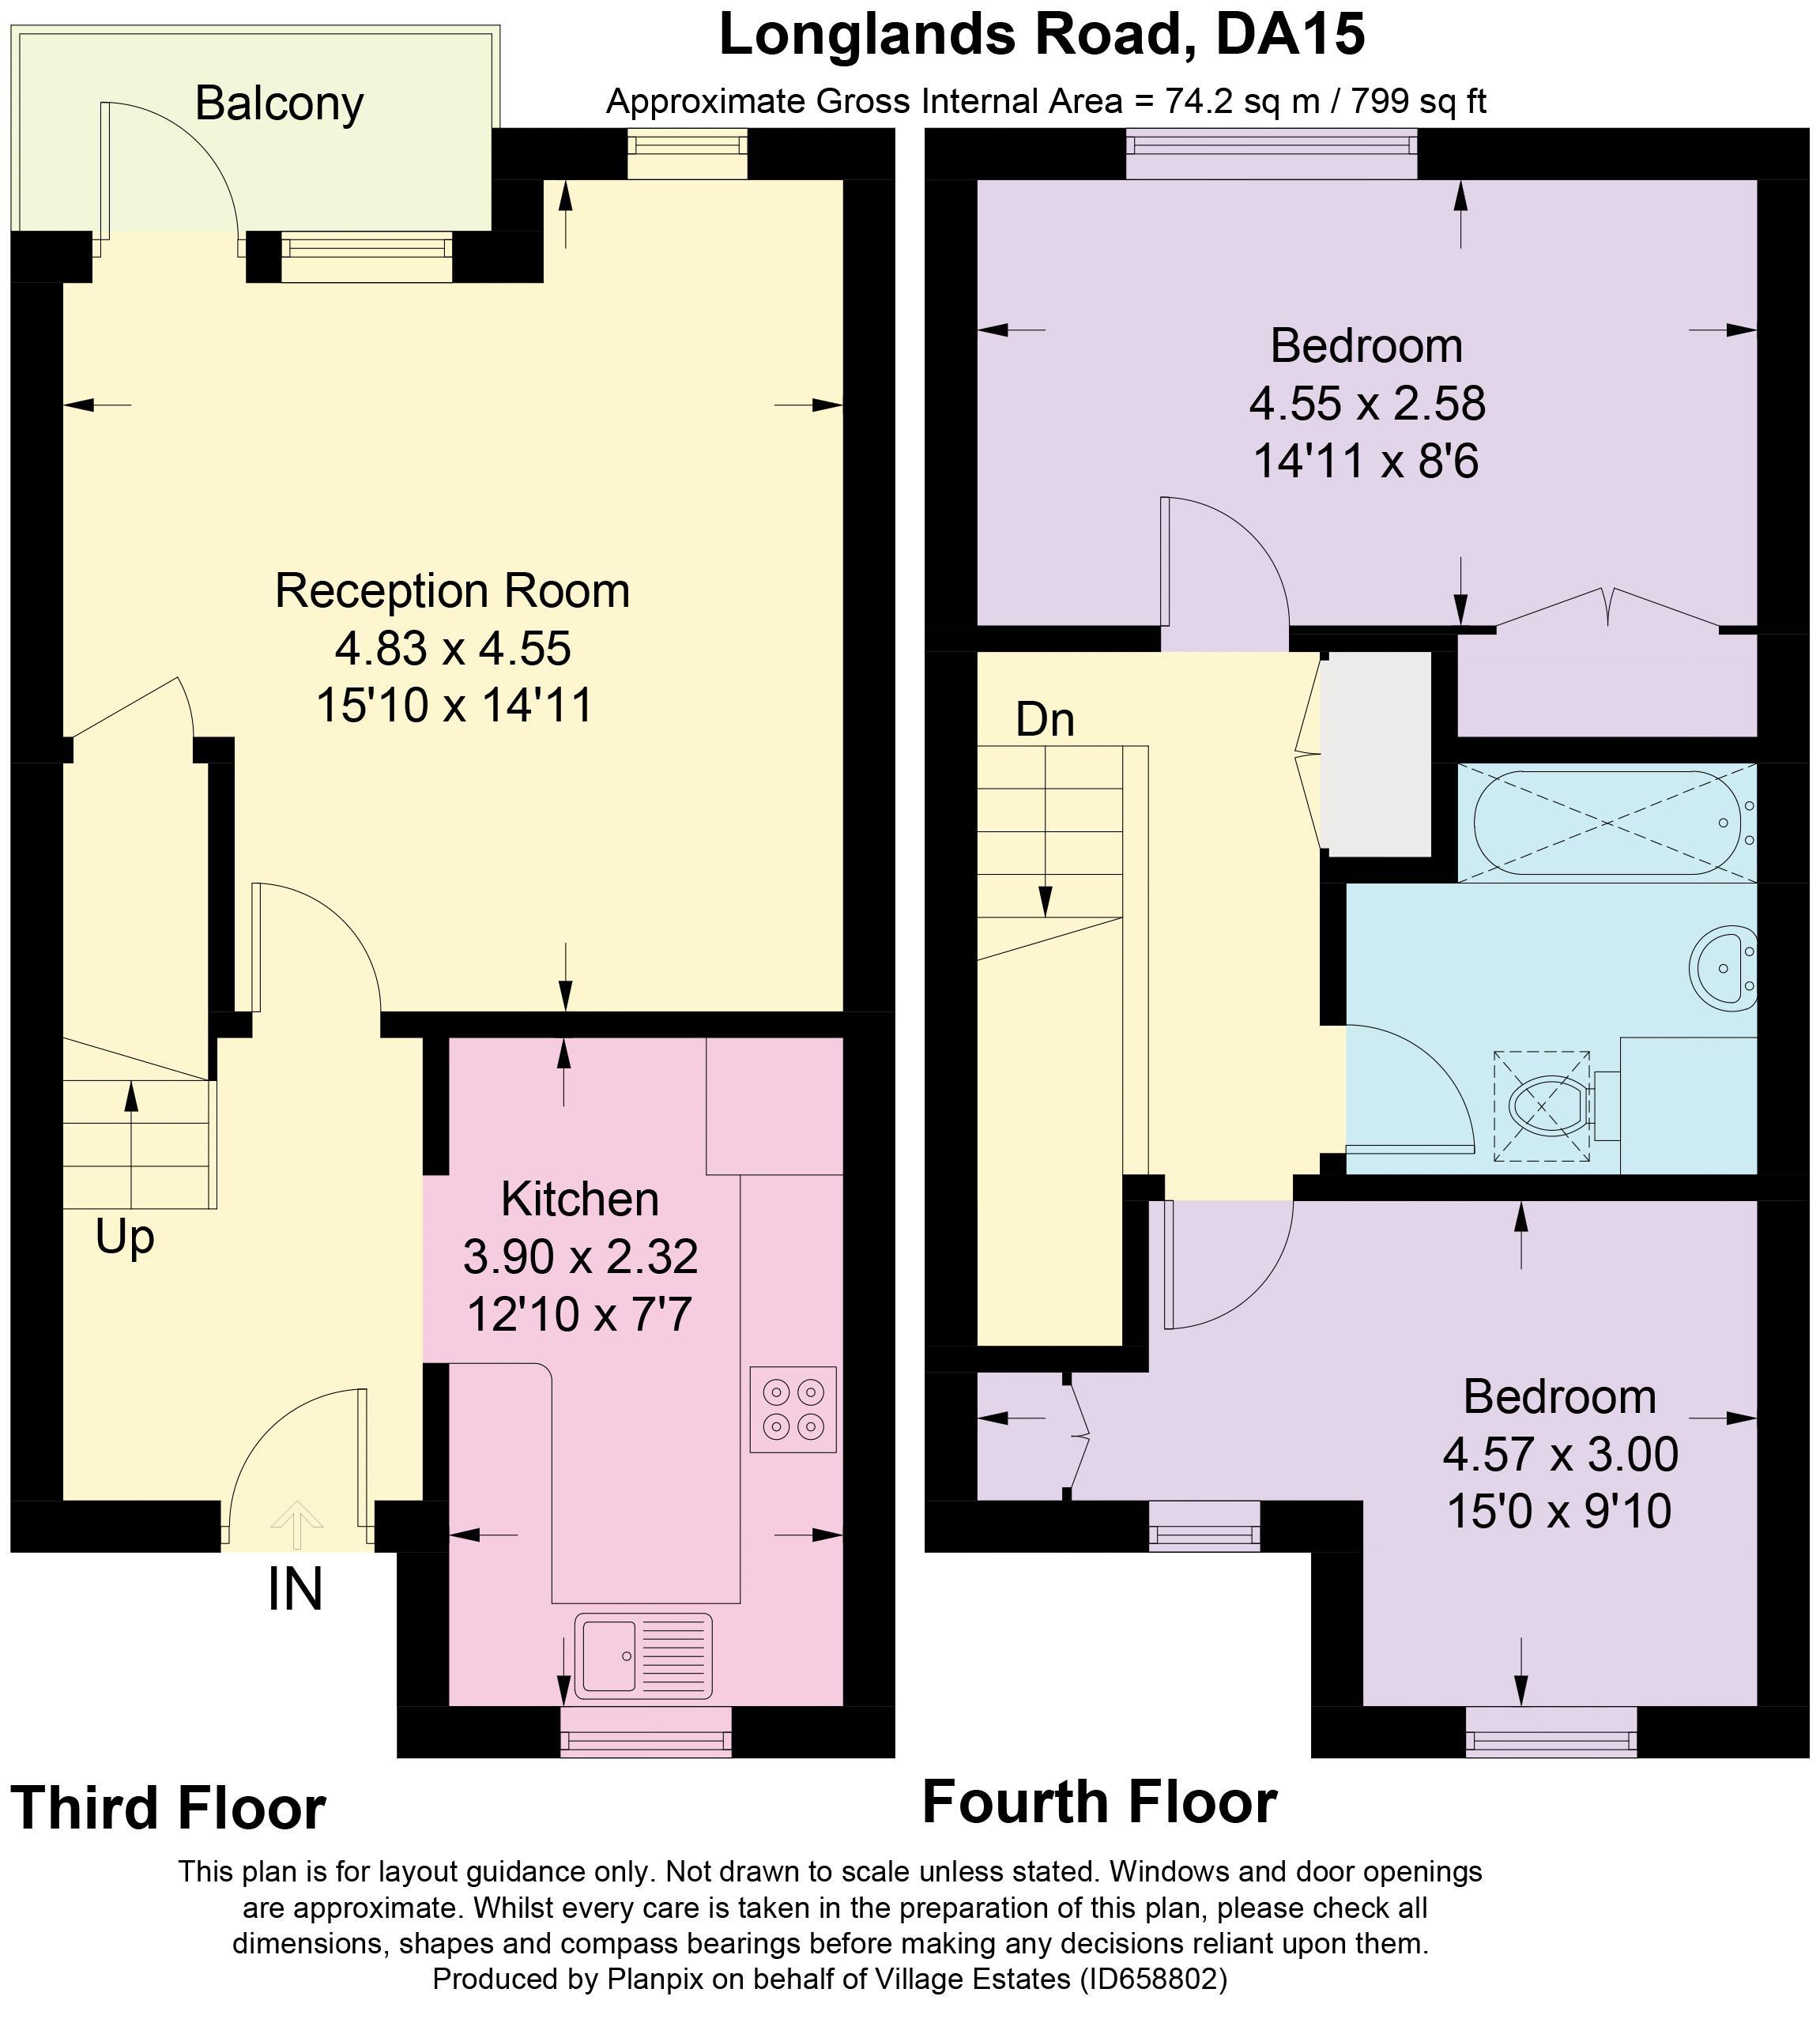 Medlar House Floorplan